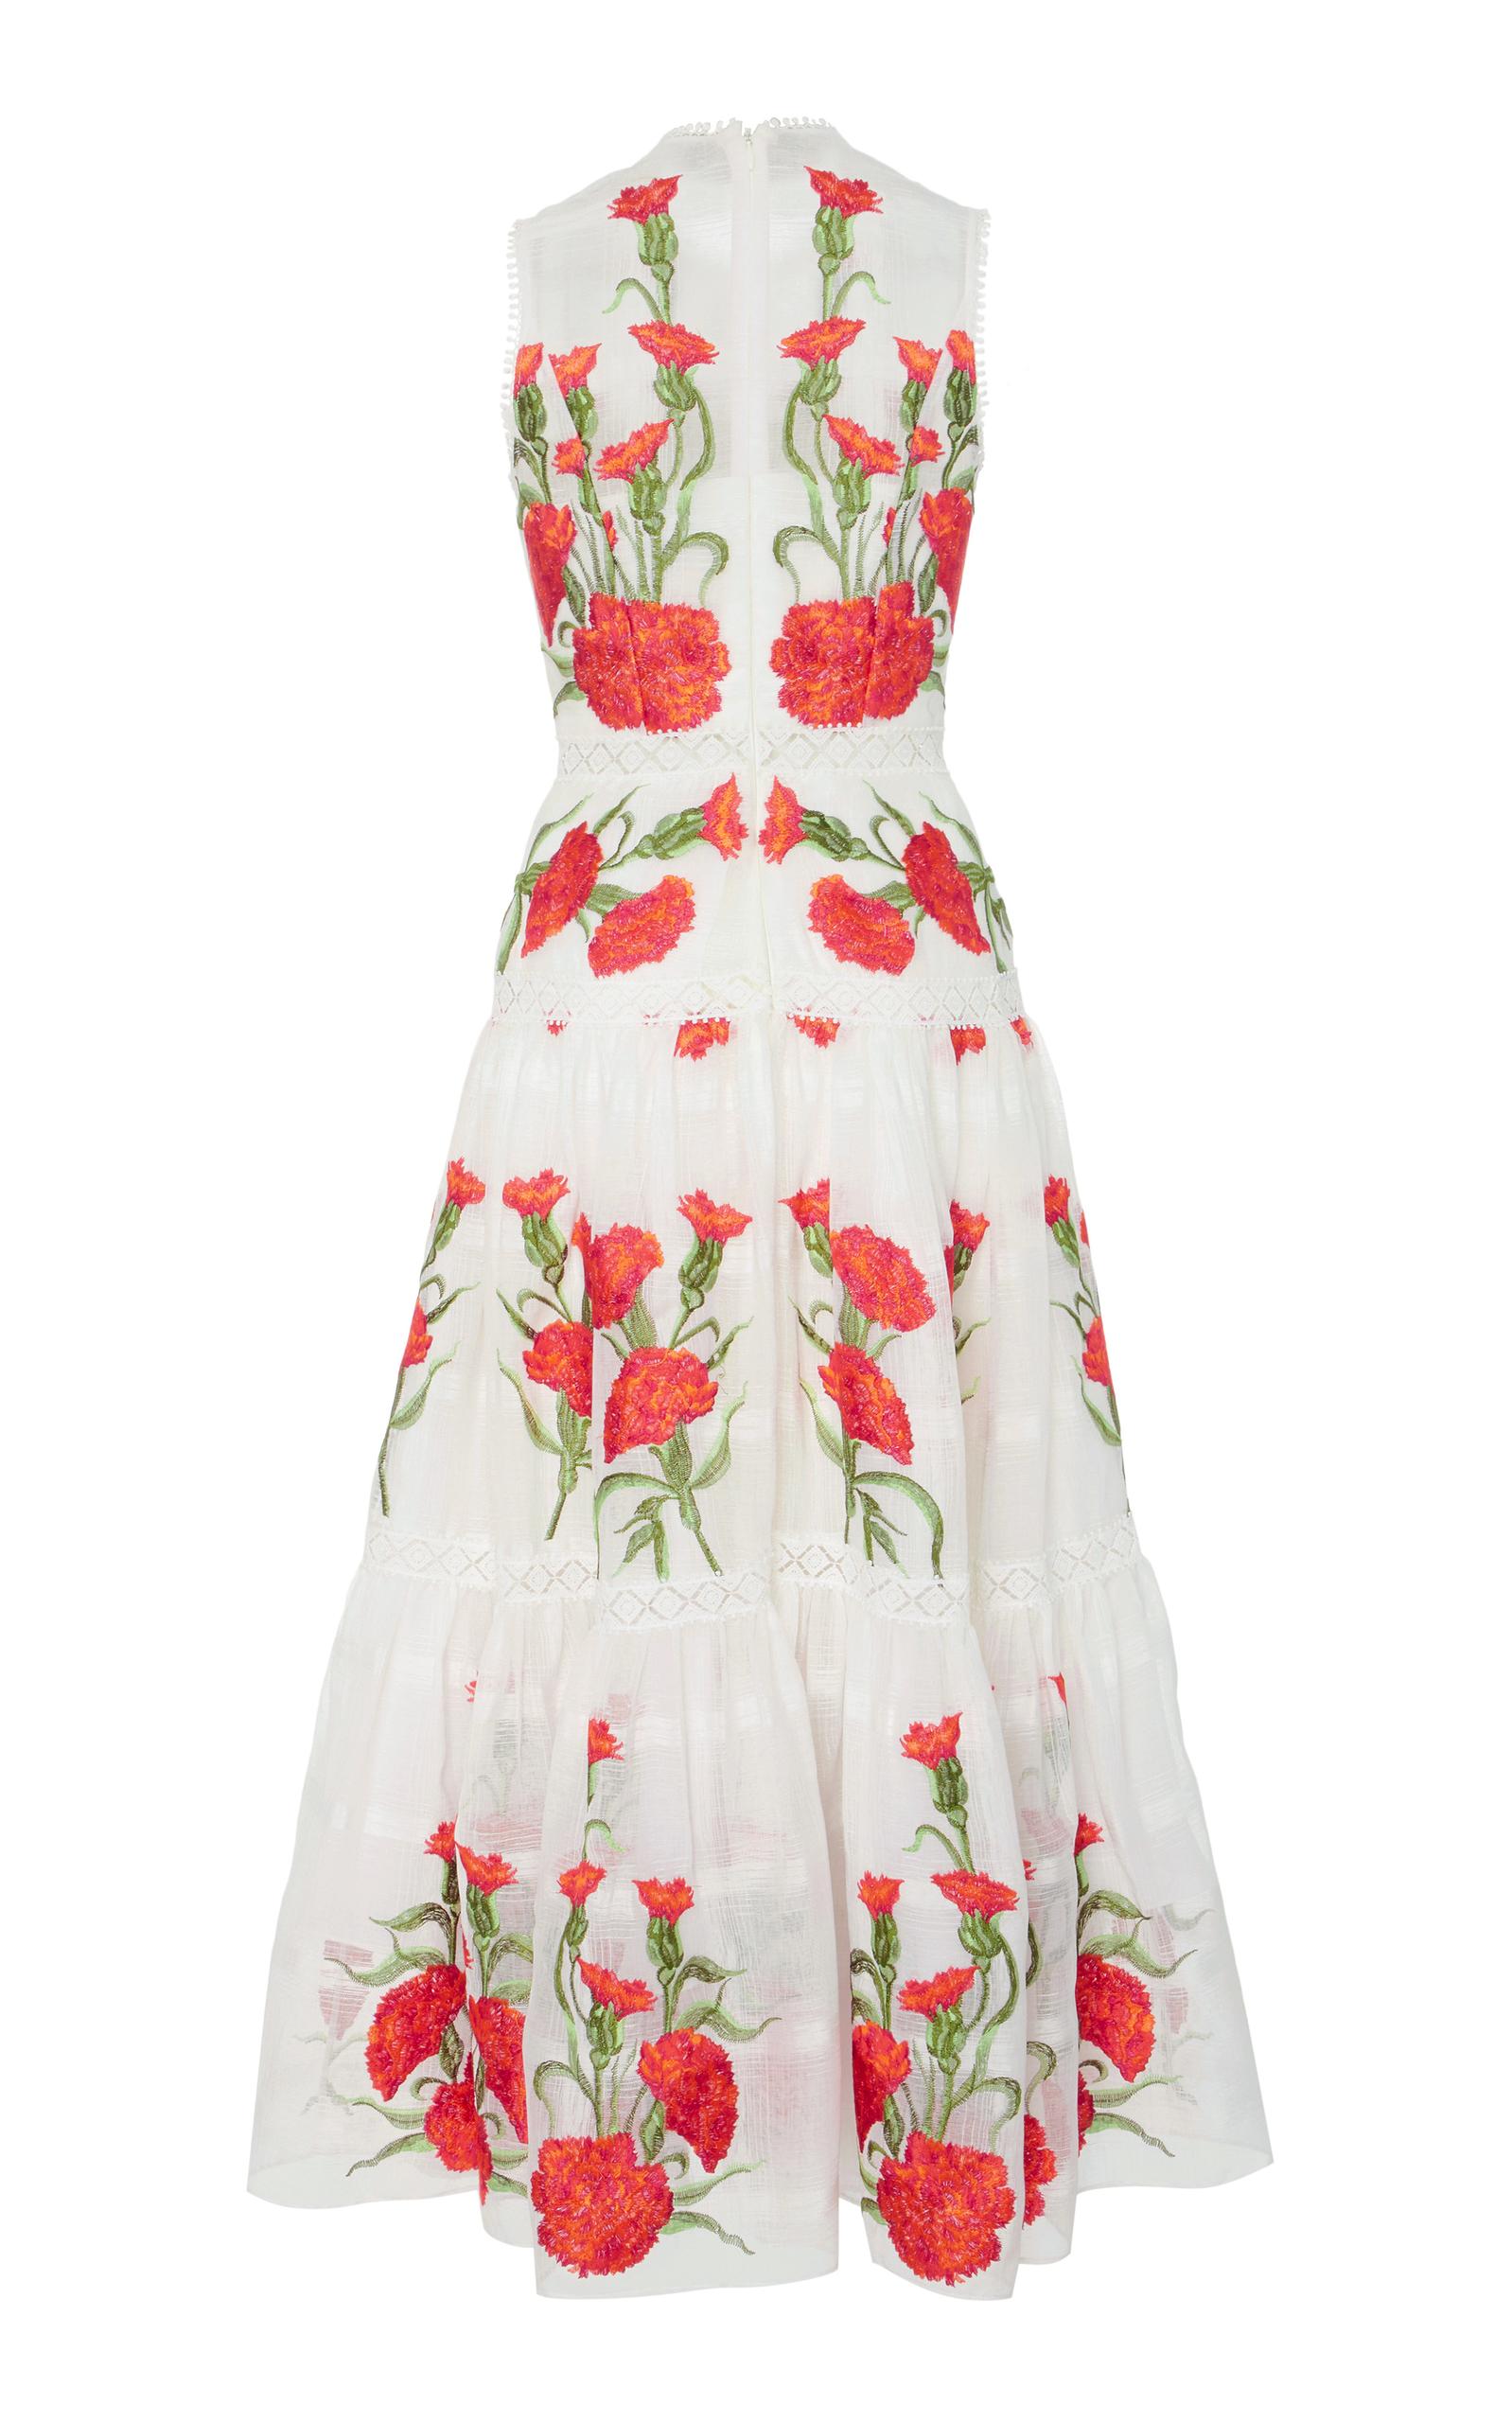 Leomie Midi Dress Alexis wI7aHGU5d